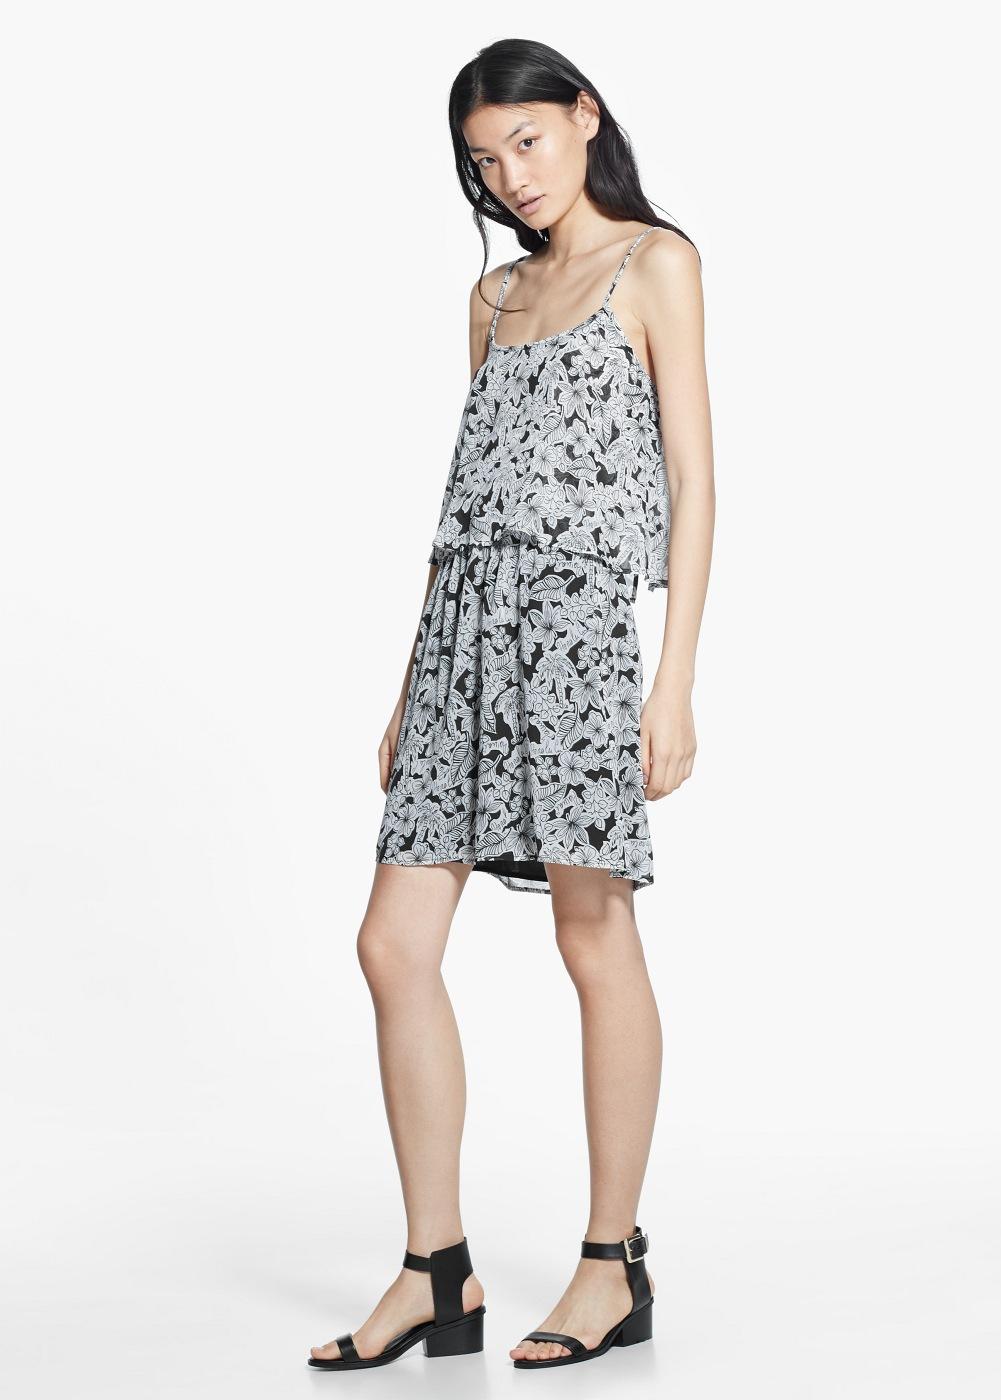 Floral Print Dress , $49.99